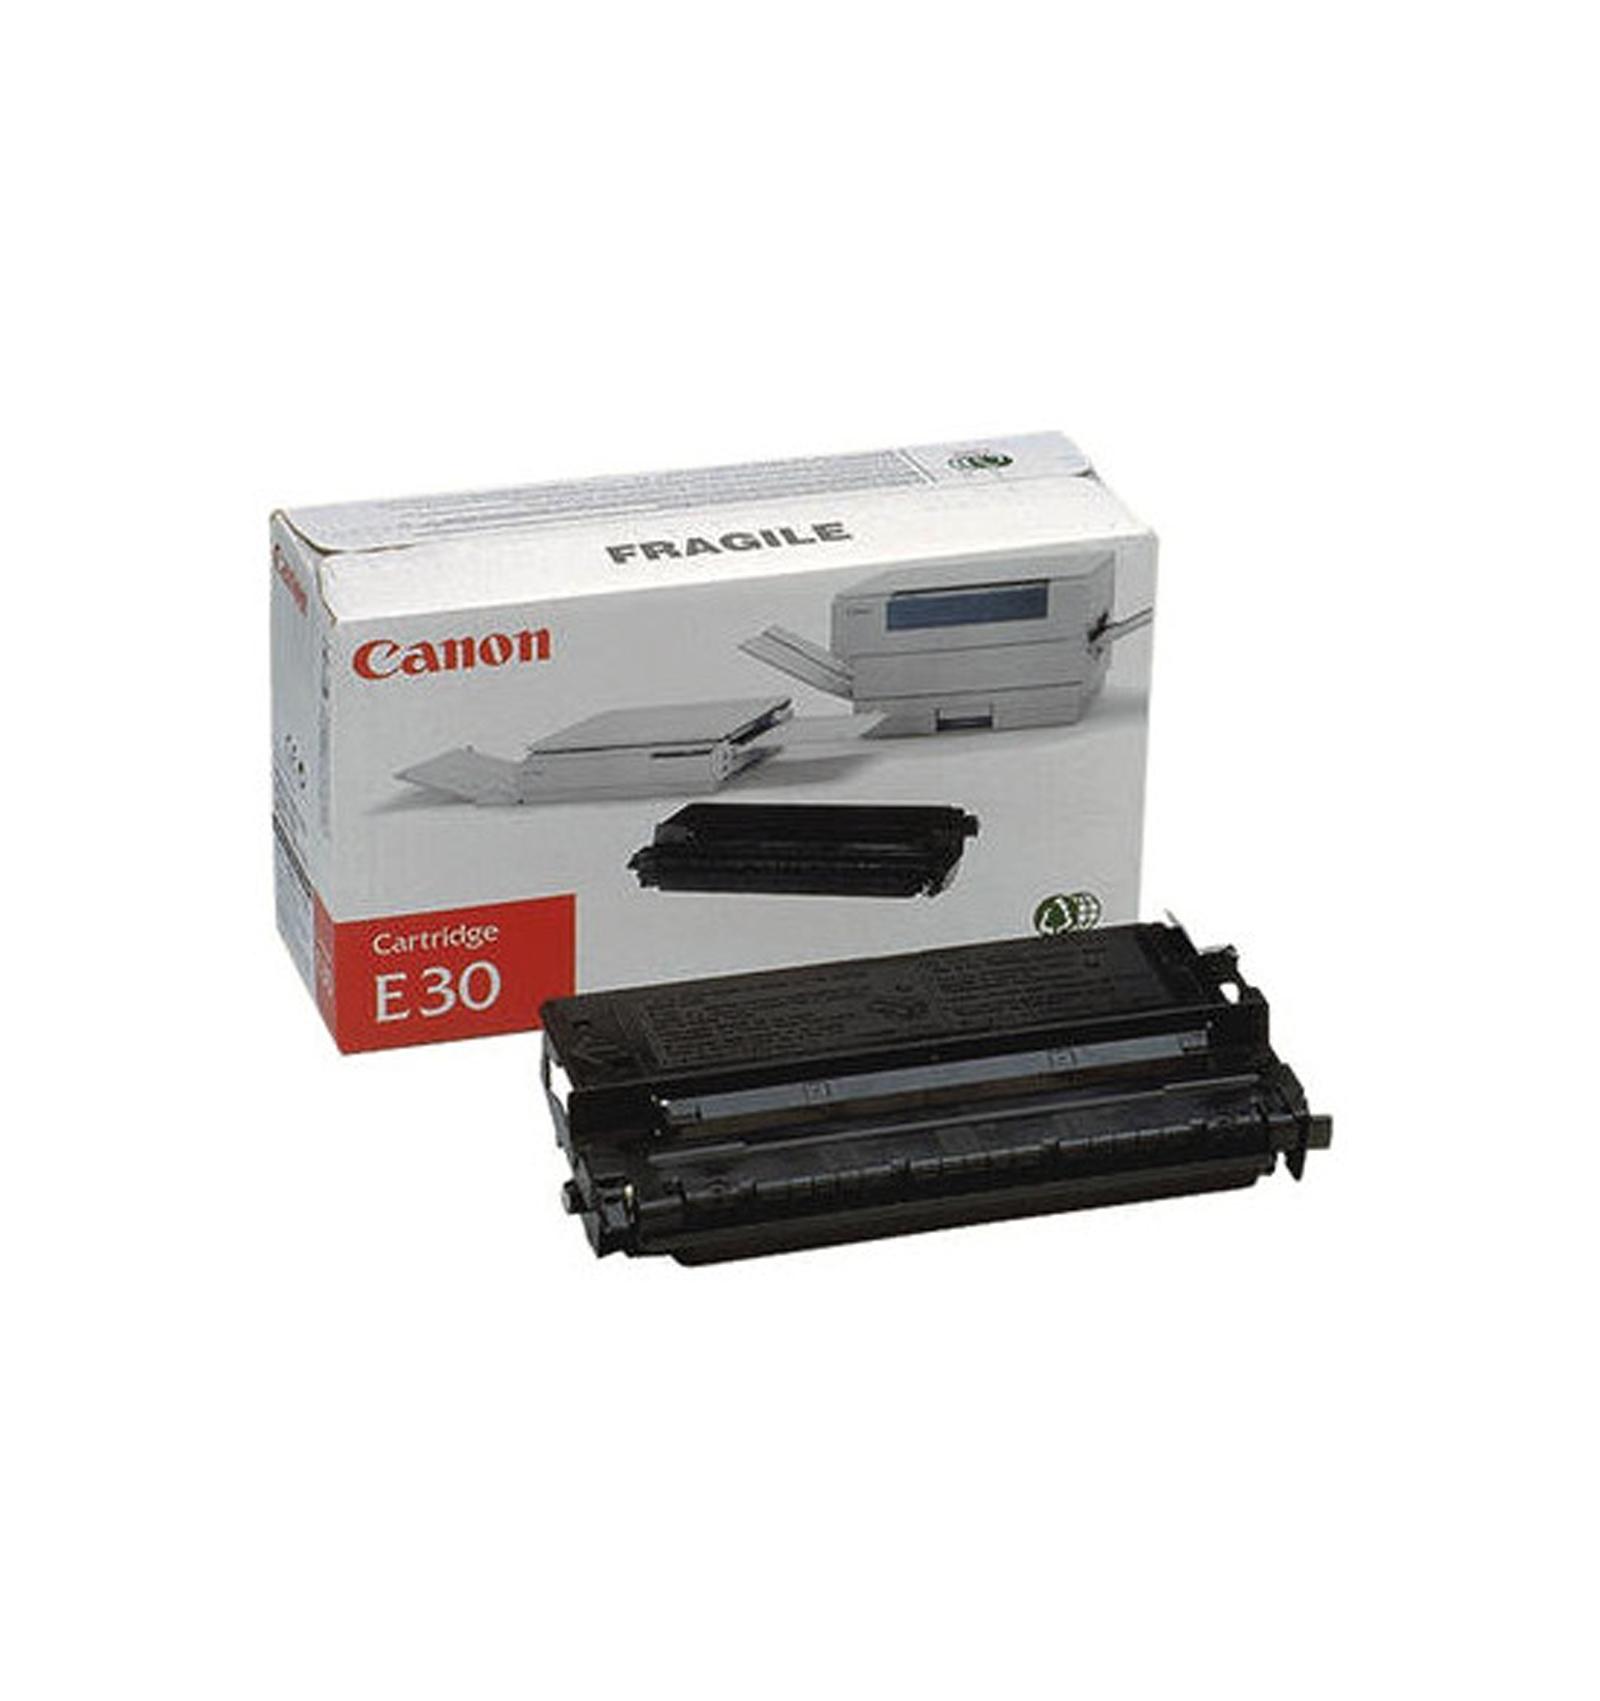 Canon E-30 для FC-2xx/3xx/530/108/208; PC-7xx; PC-8xx